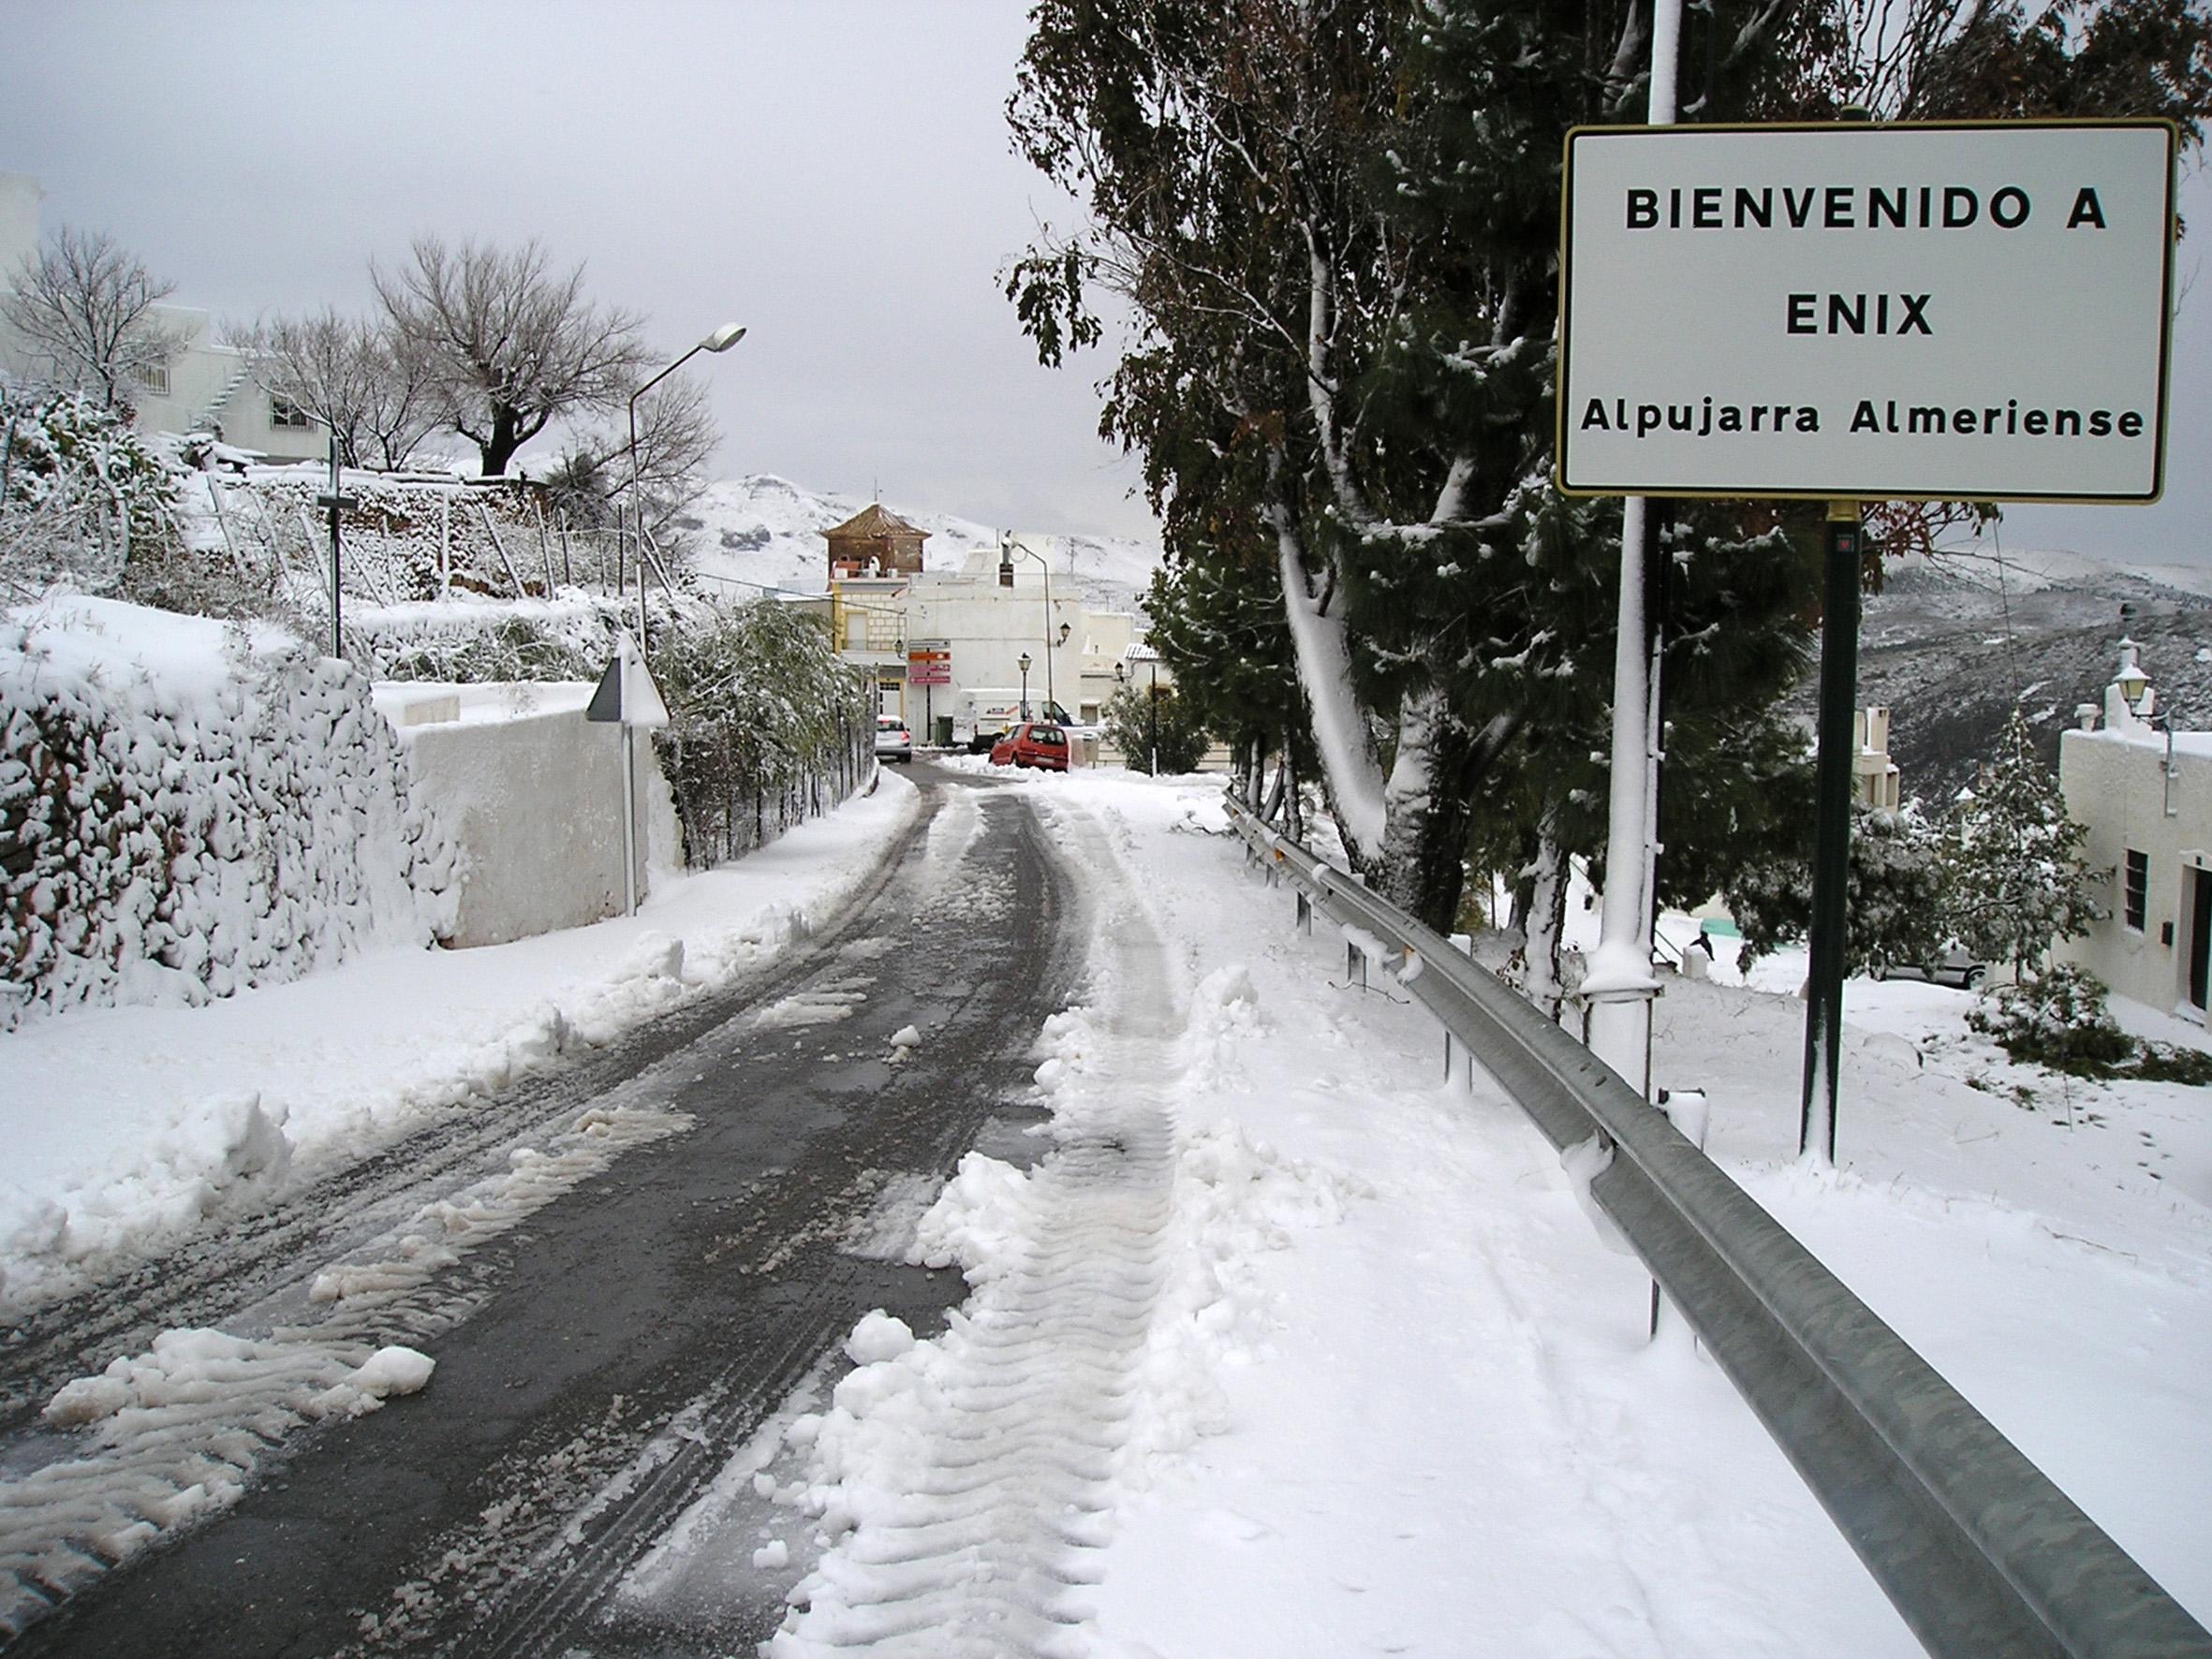 Enix - Almeria Trail - PR-A 120